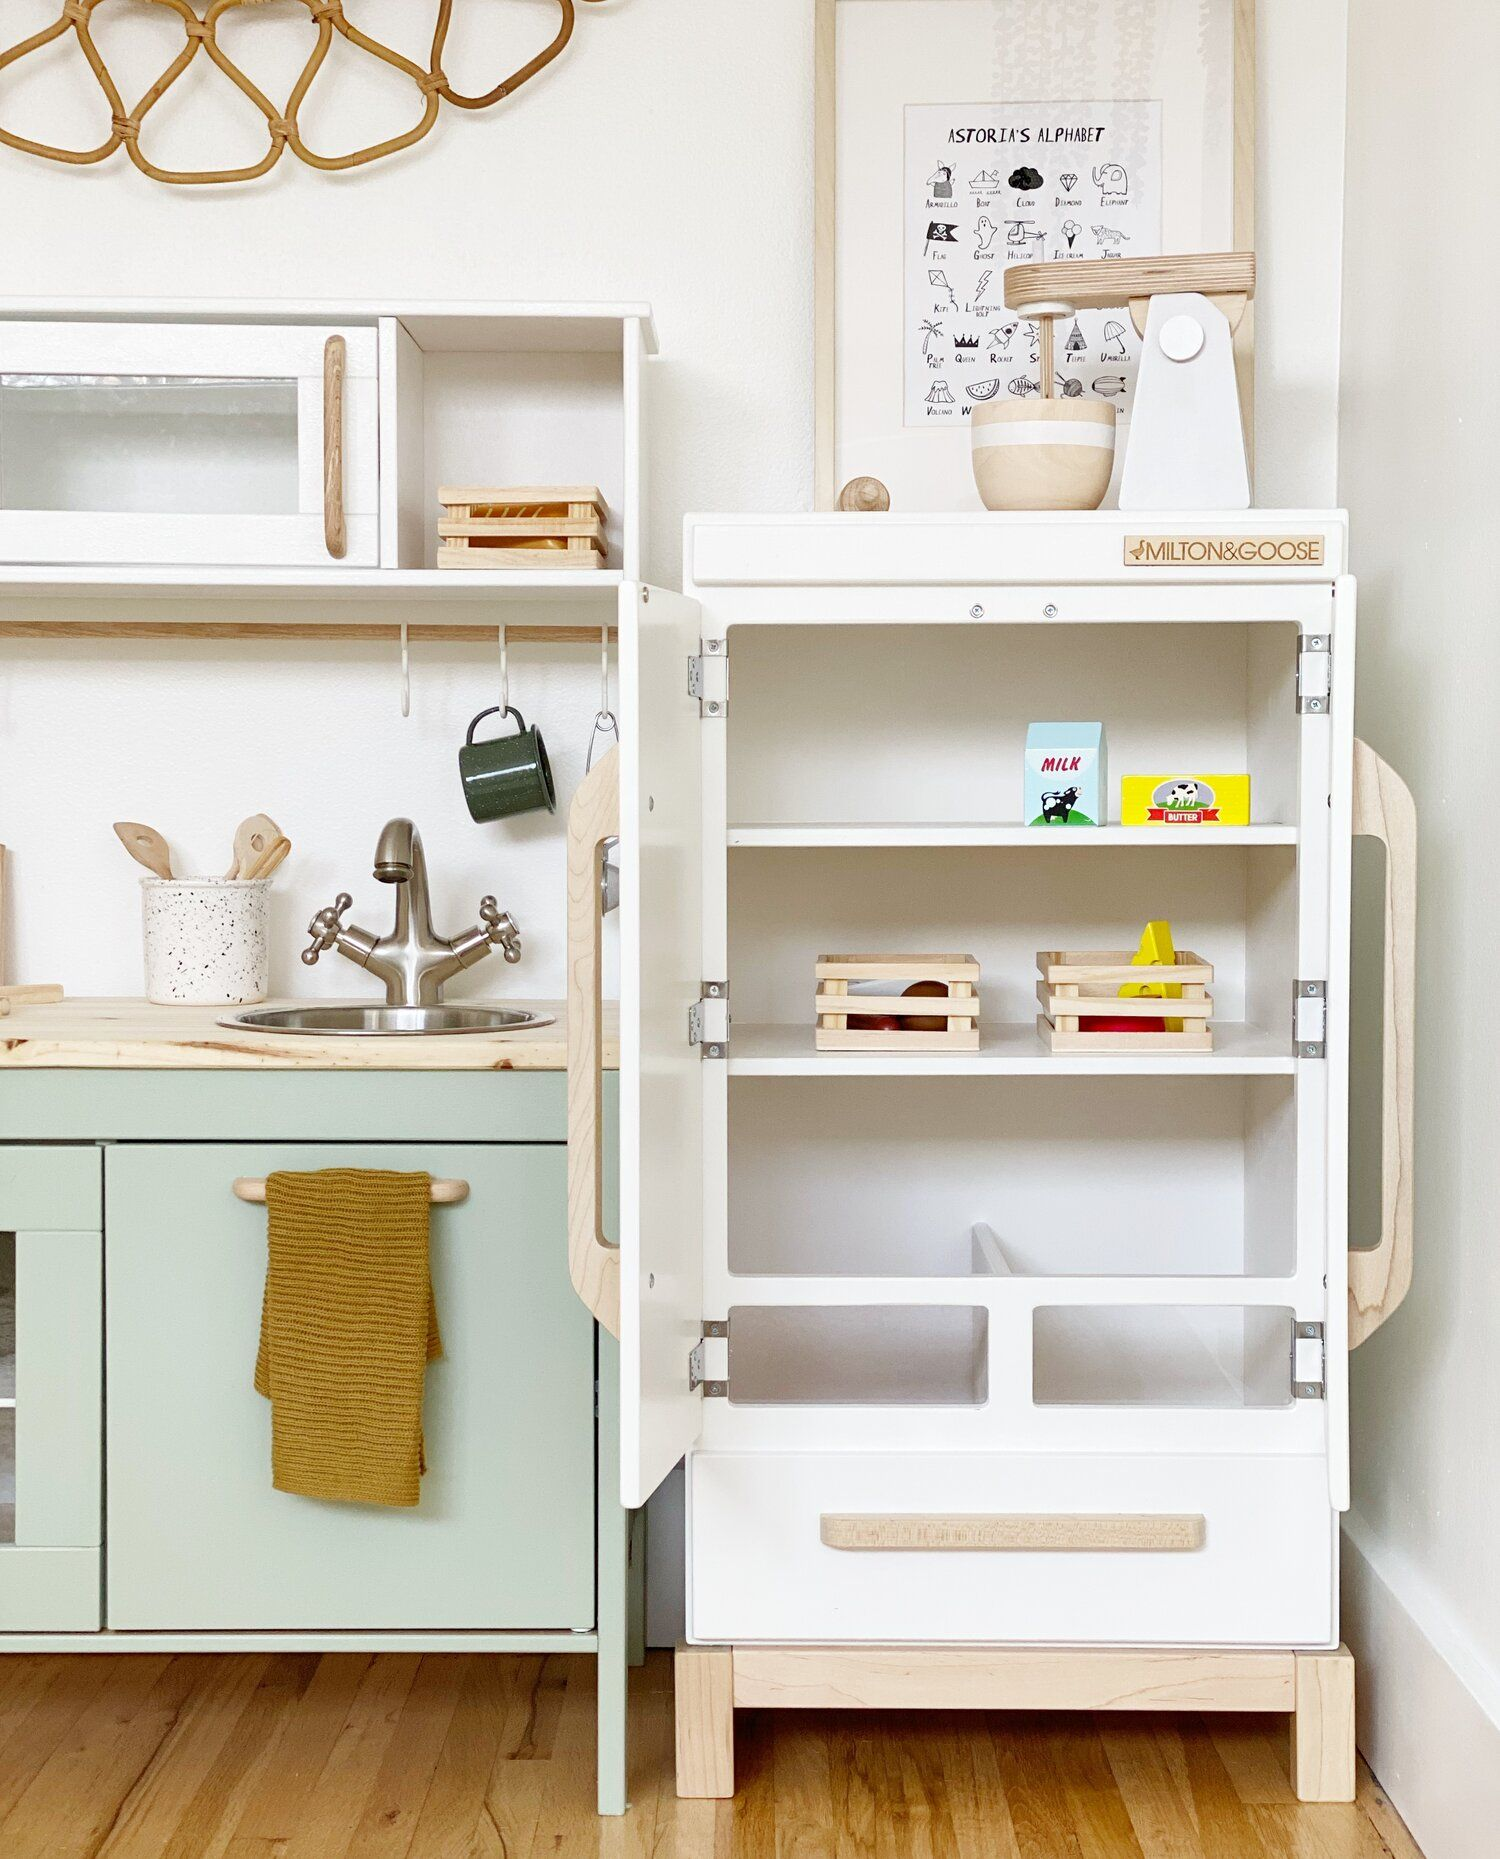 Ikea play kitchen hack — in 2020 Ikea play kitchen, Play